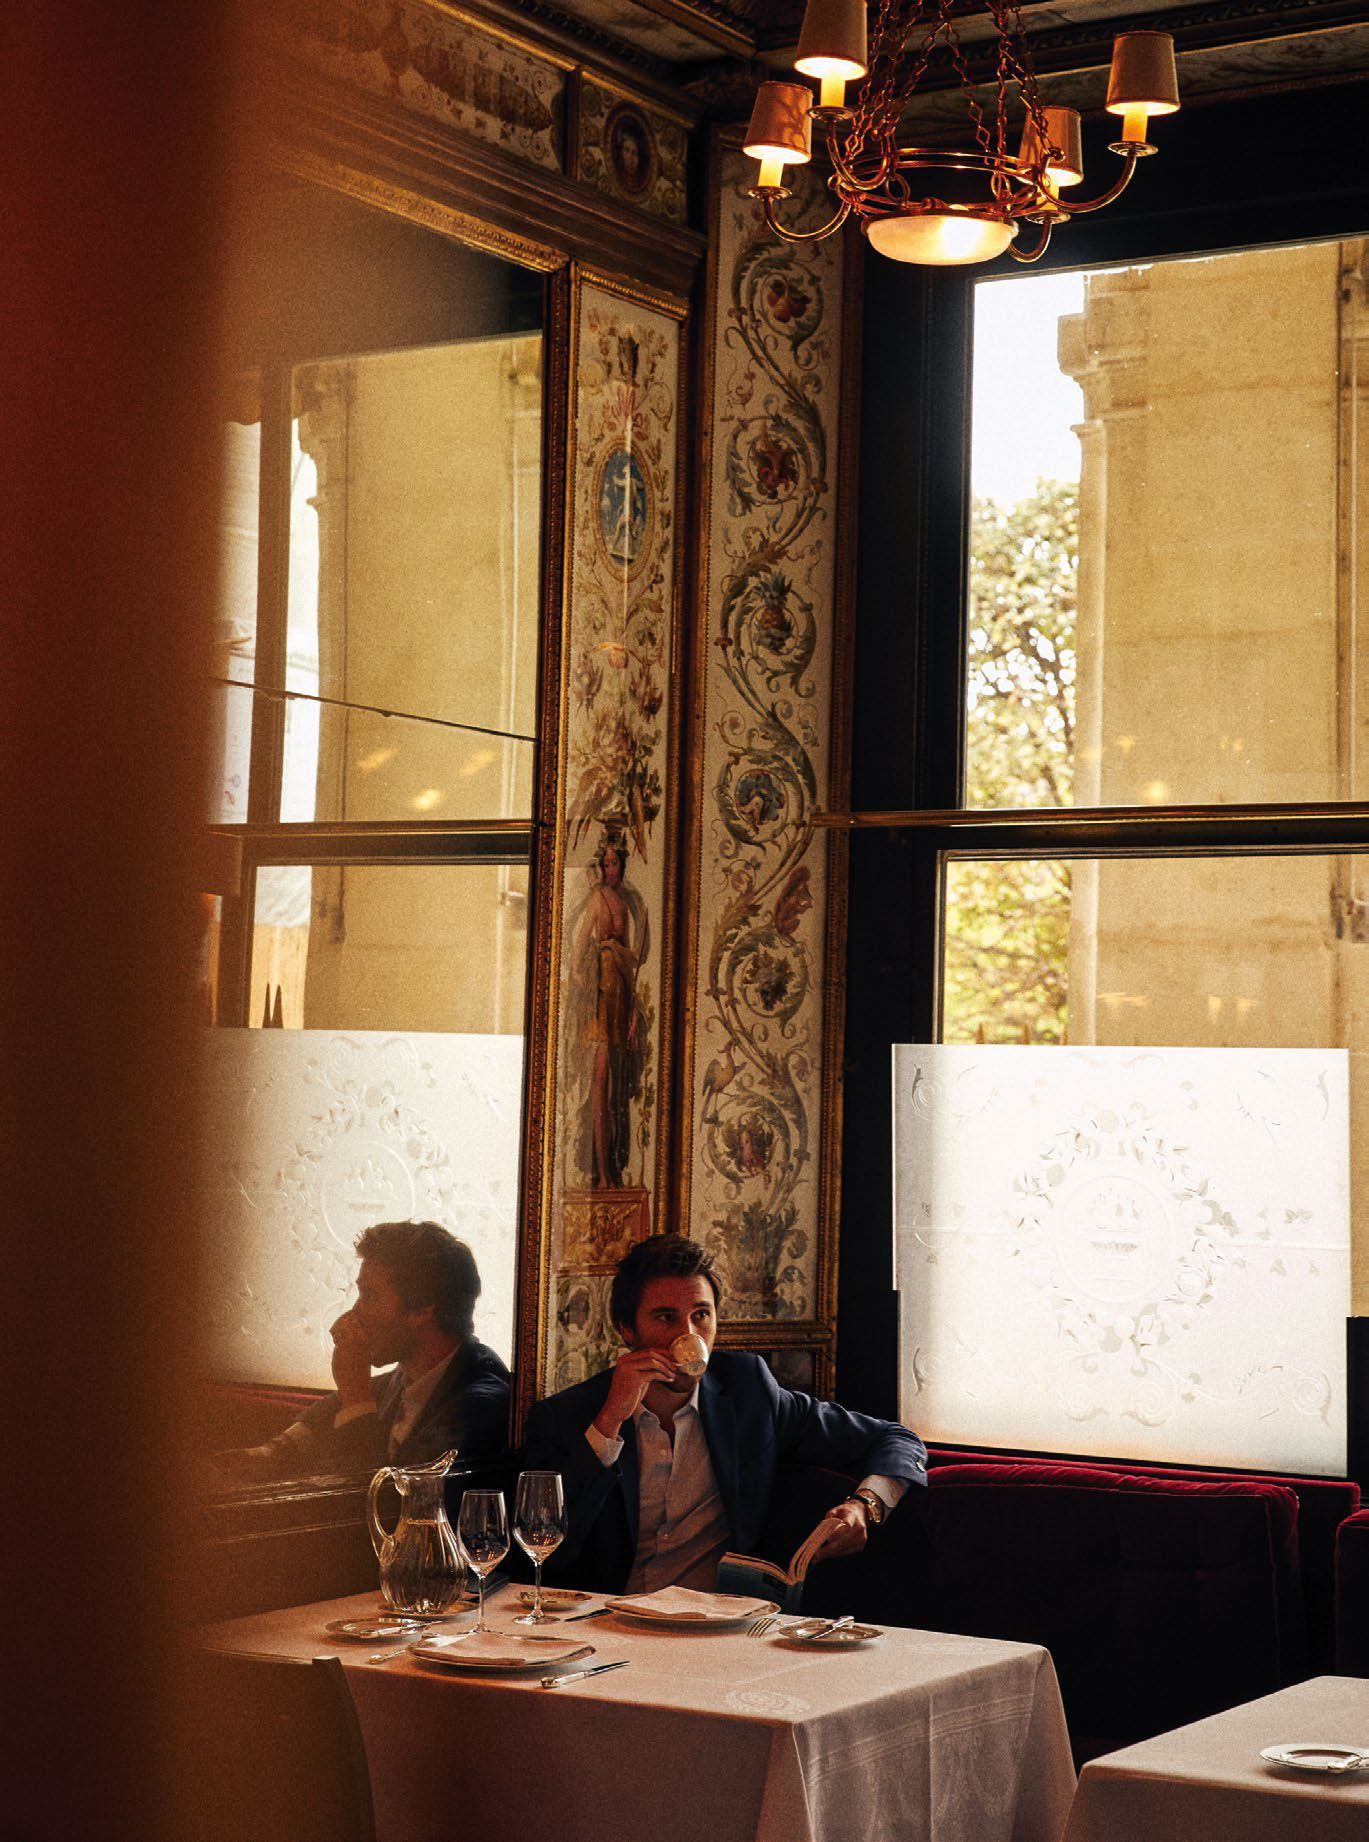 A candid photo of a man at a Parisian restaurant